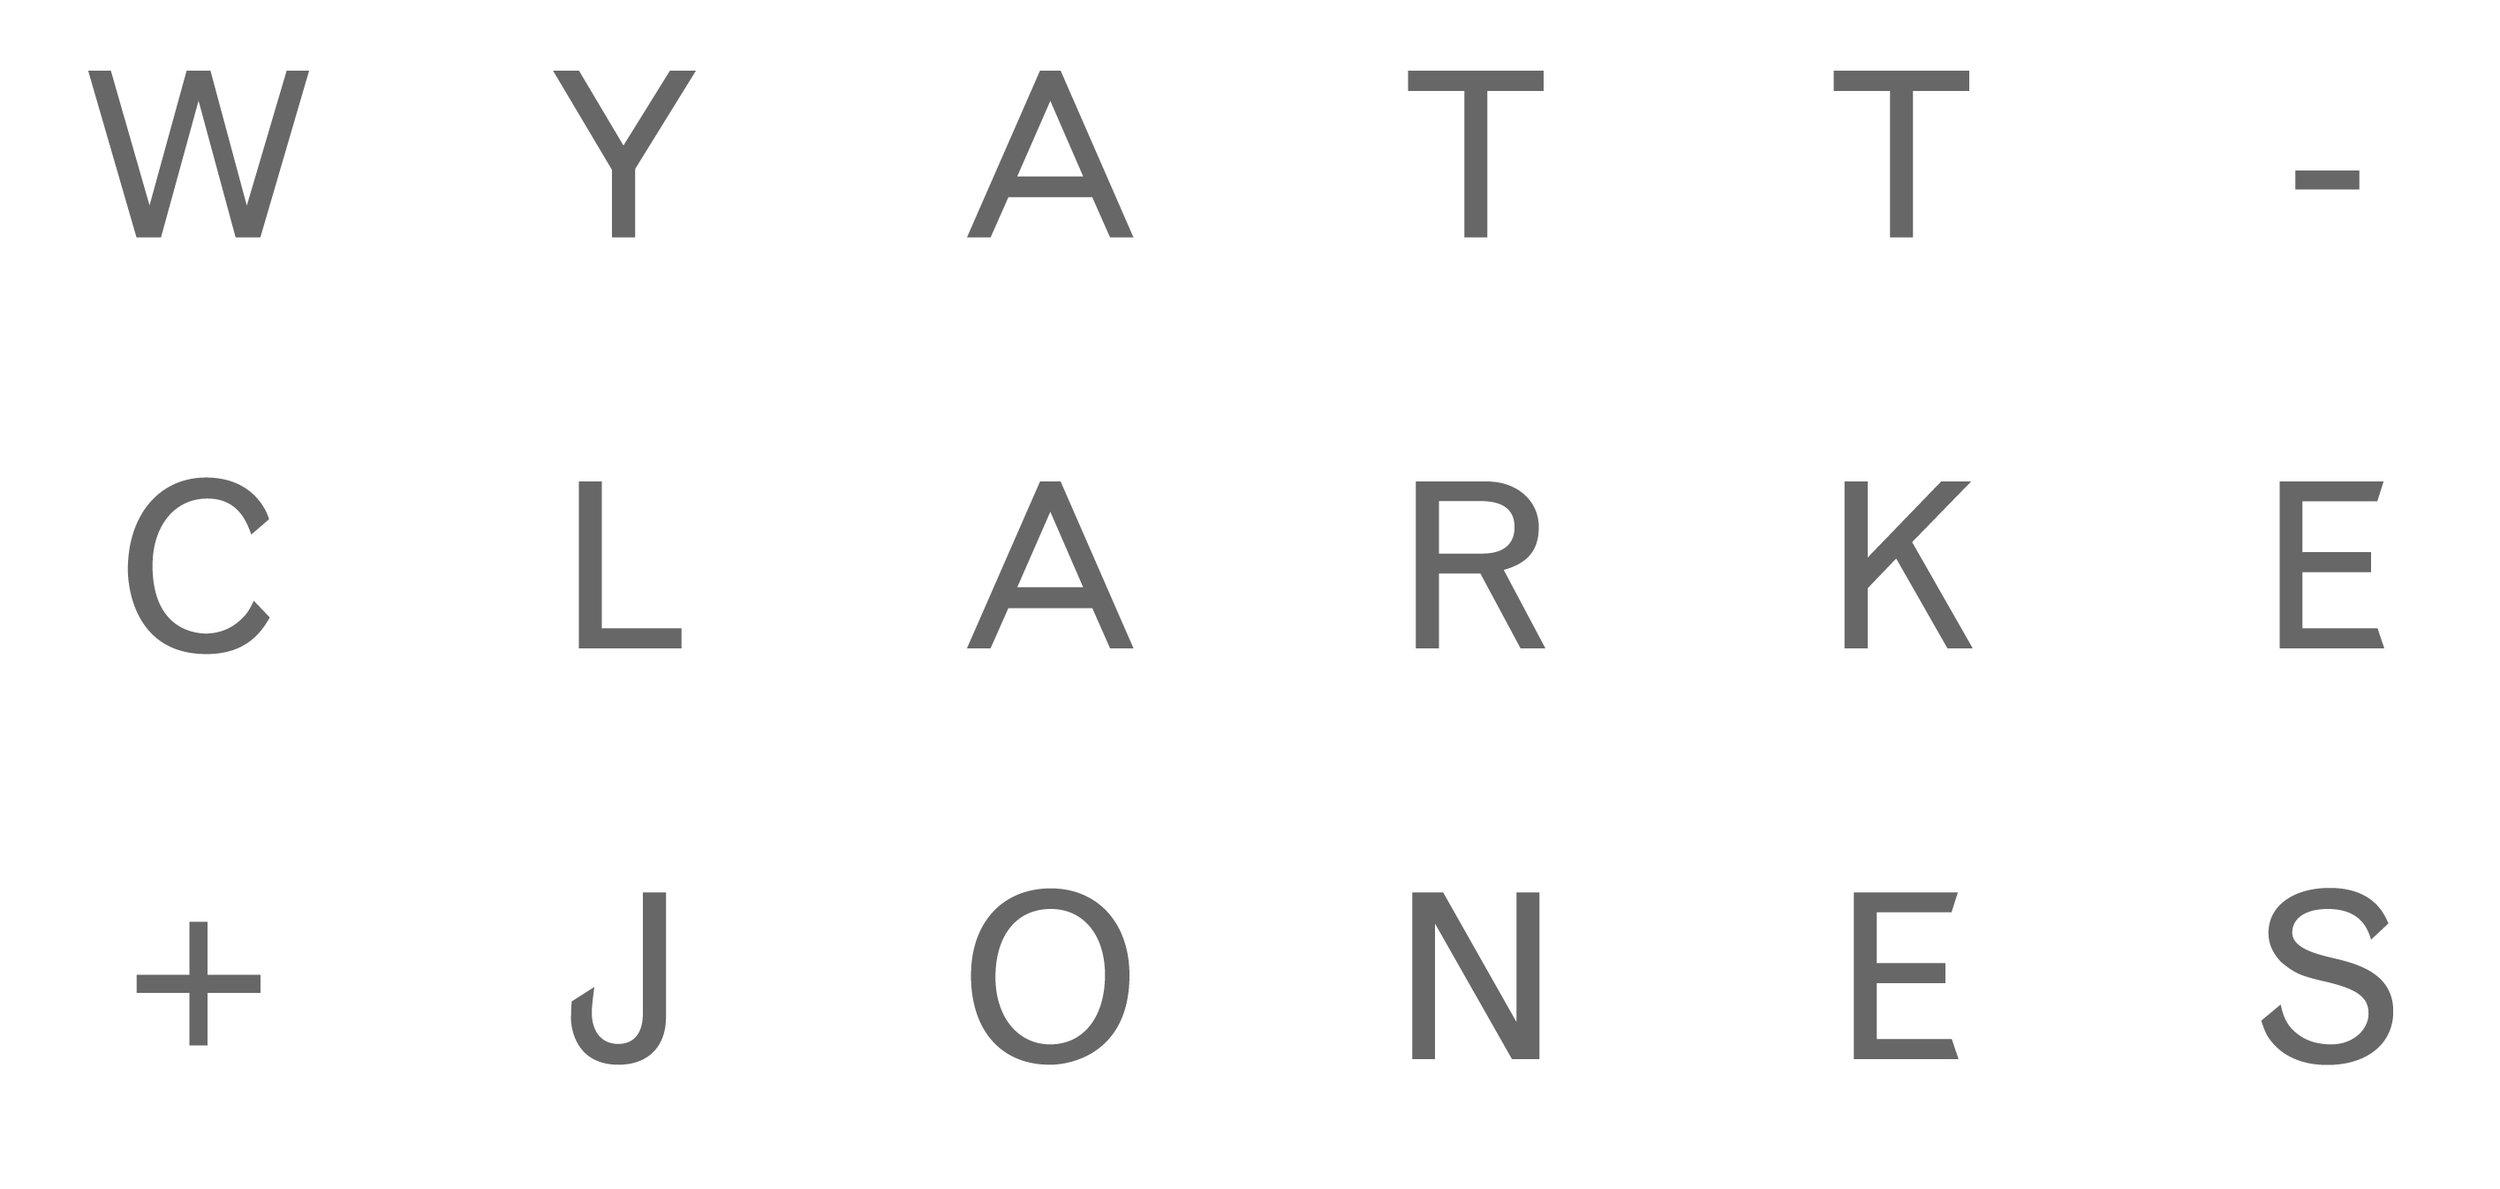 Wyatt-ClarkeJones.jpg